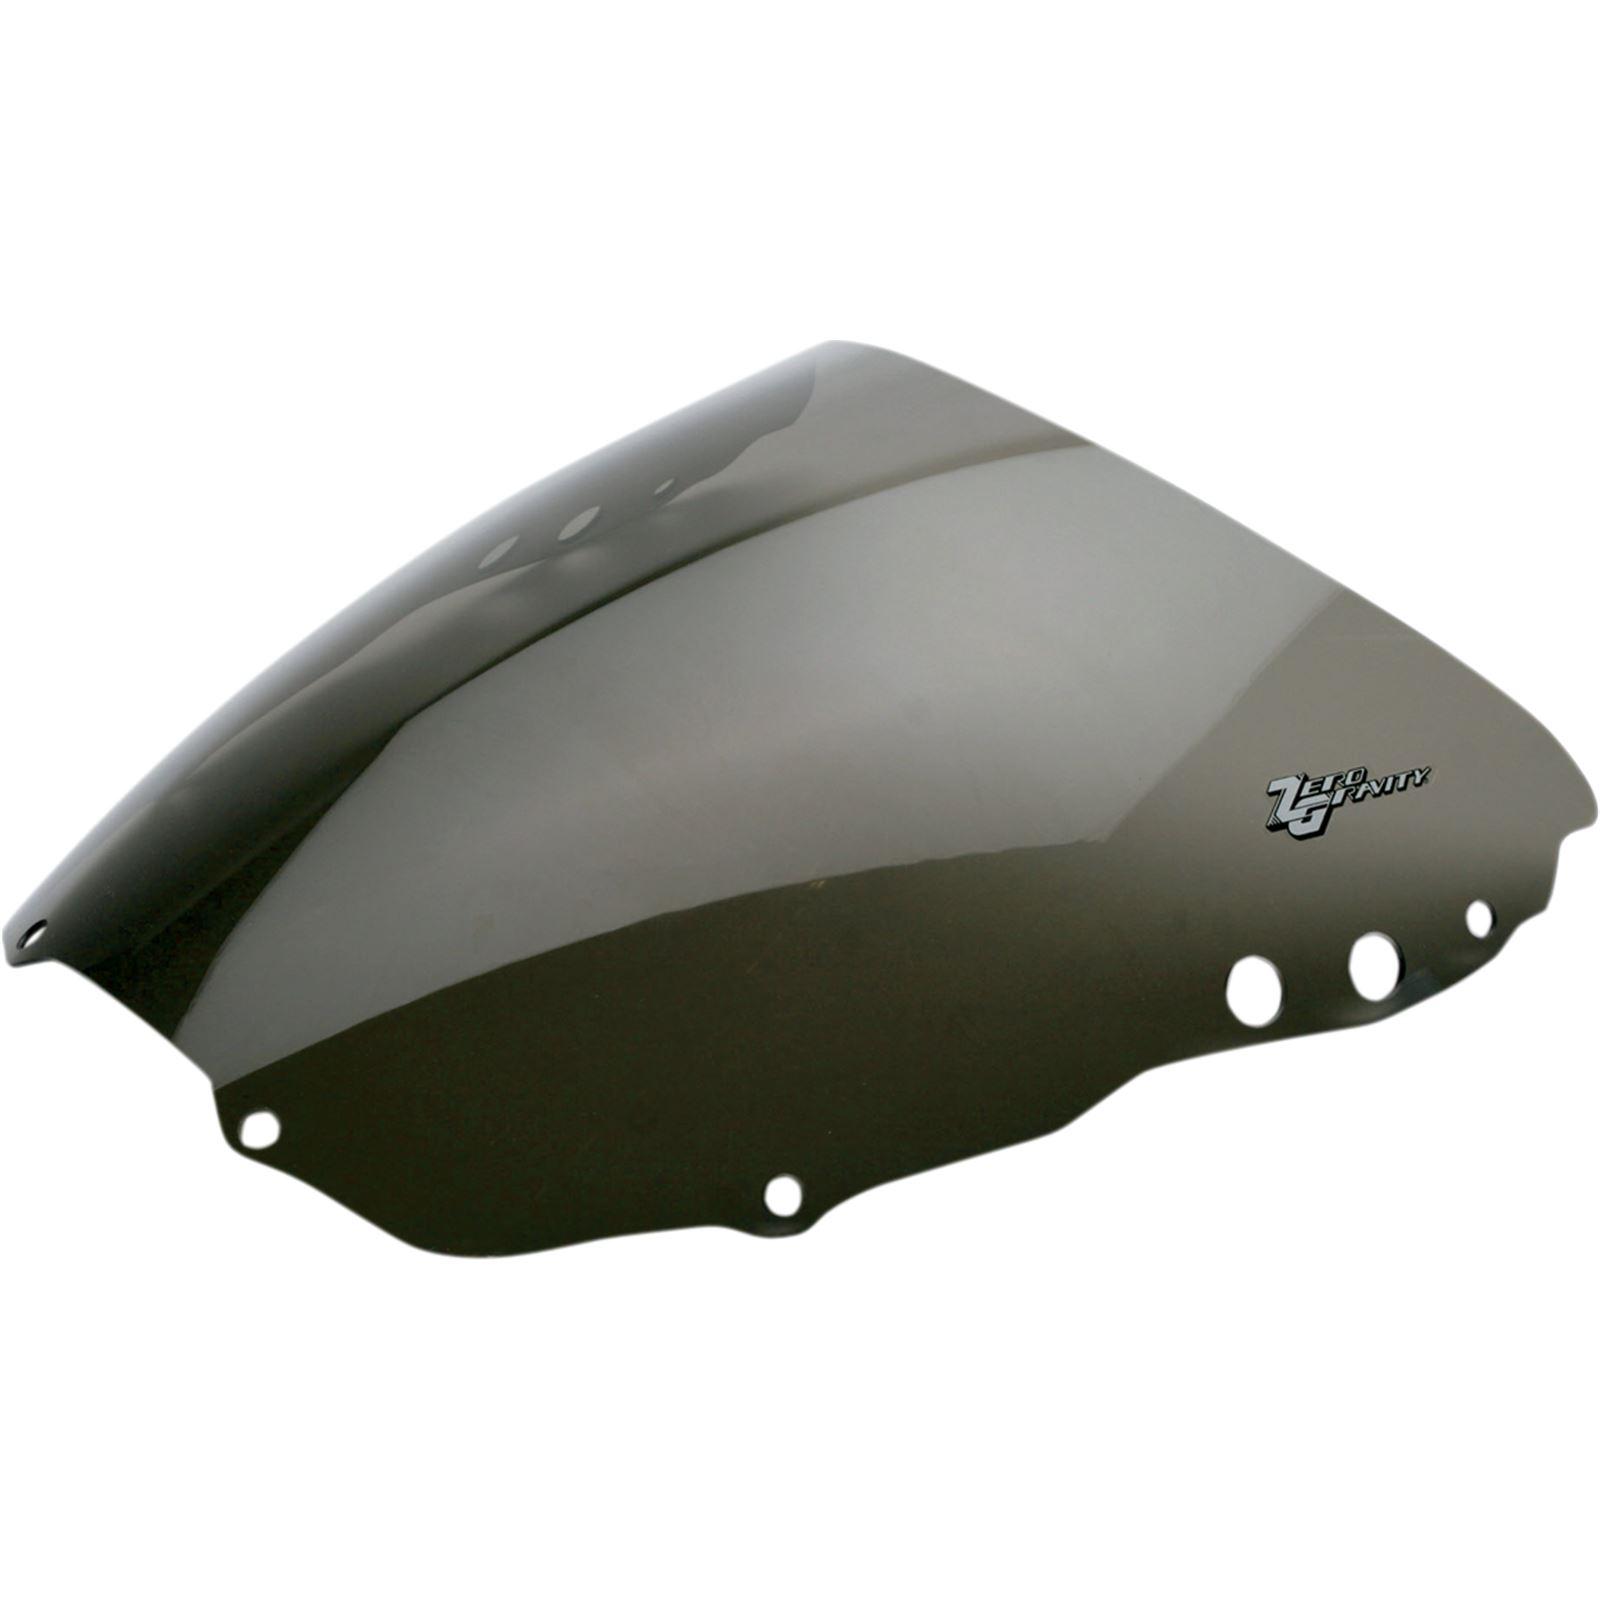 Zero Gravity Windshields Windscreen - Smoke - CBR900RR '98-'99